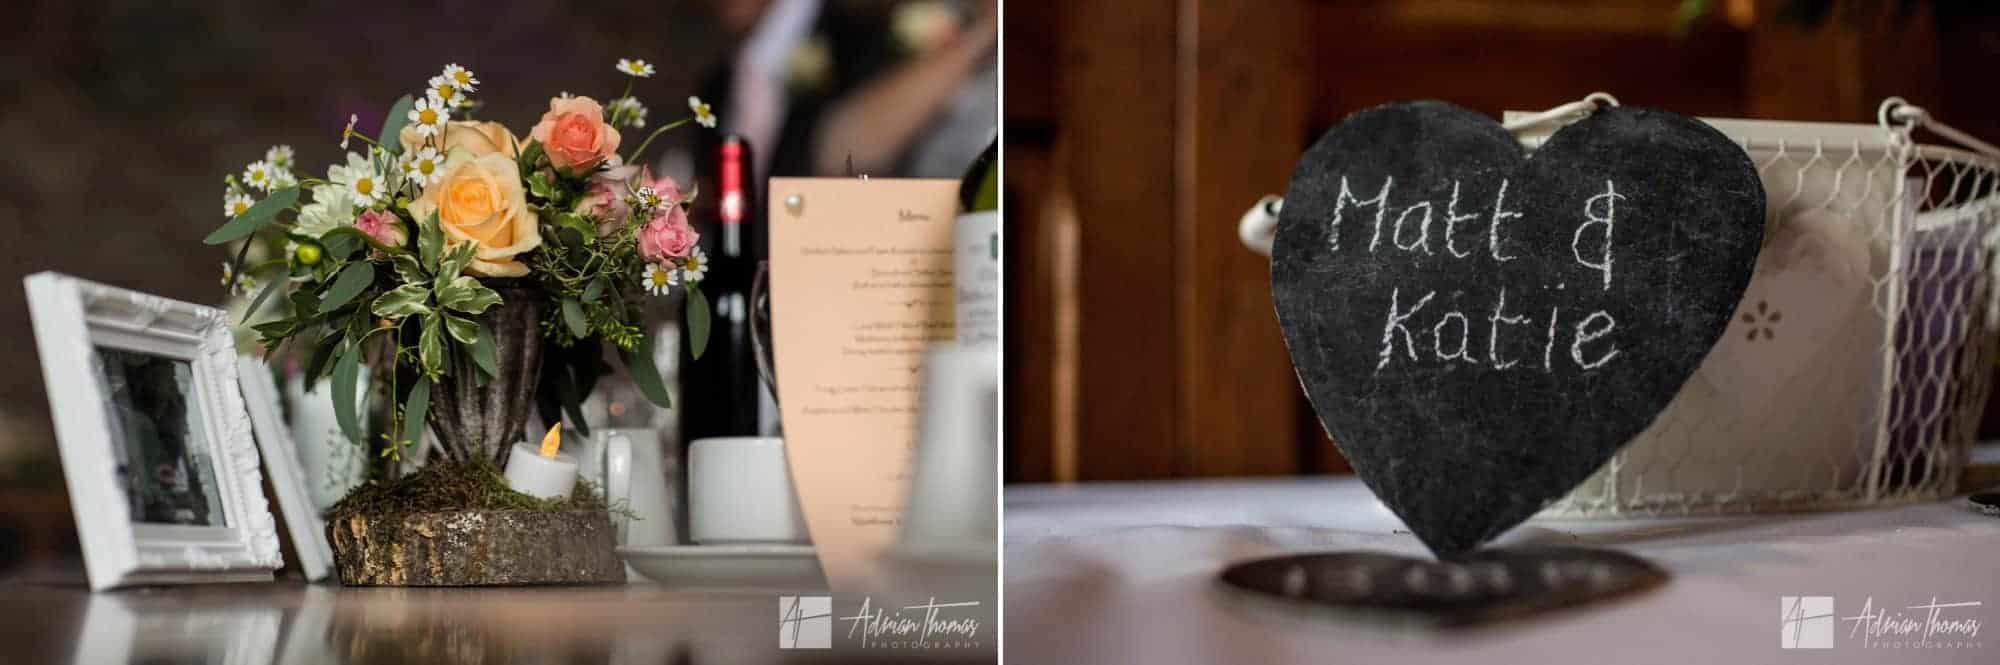 Wedding reception decorations.